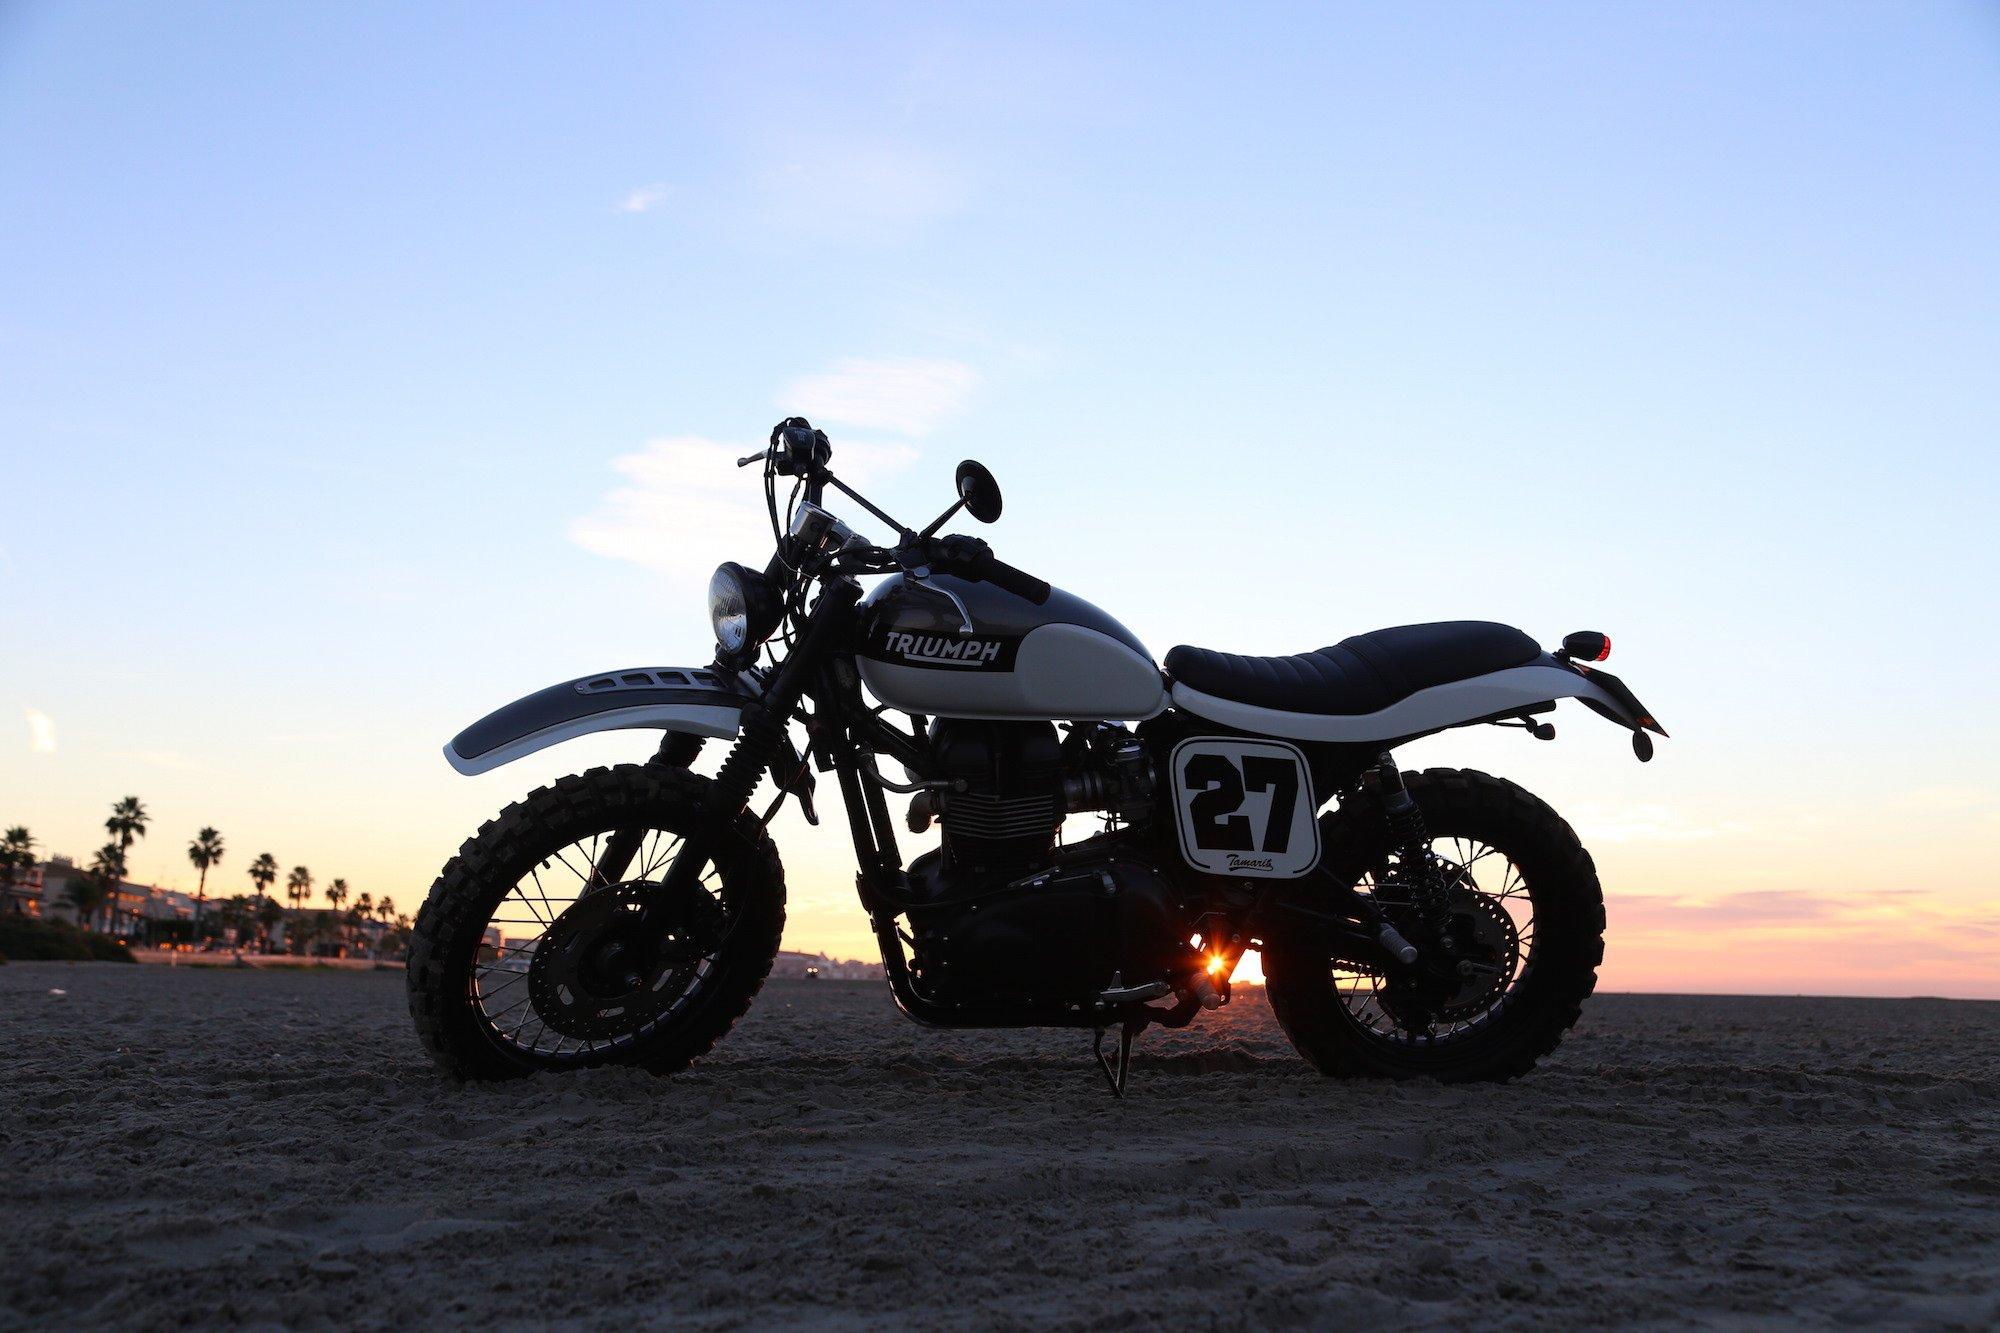 Triumph Scrambler by Tamarit Spanish Motorcycles 4